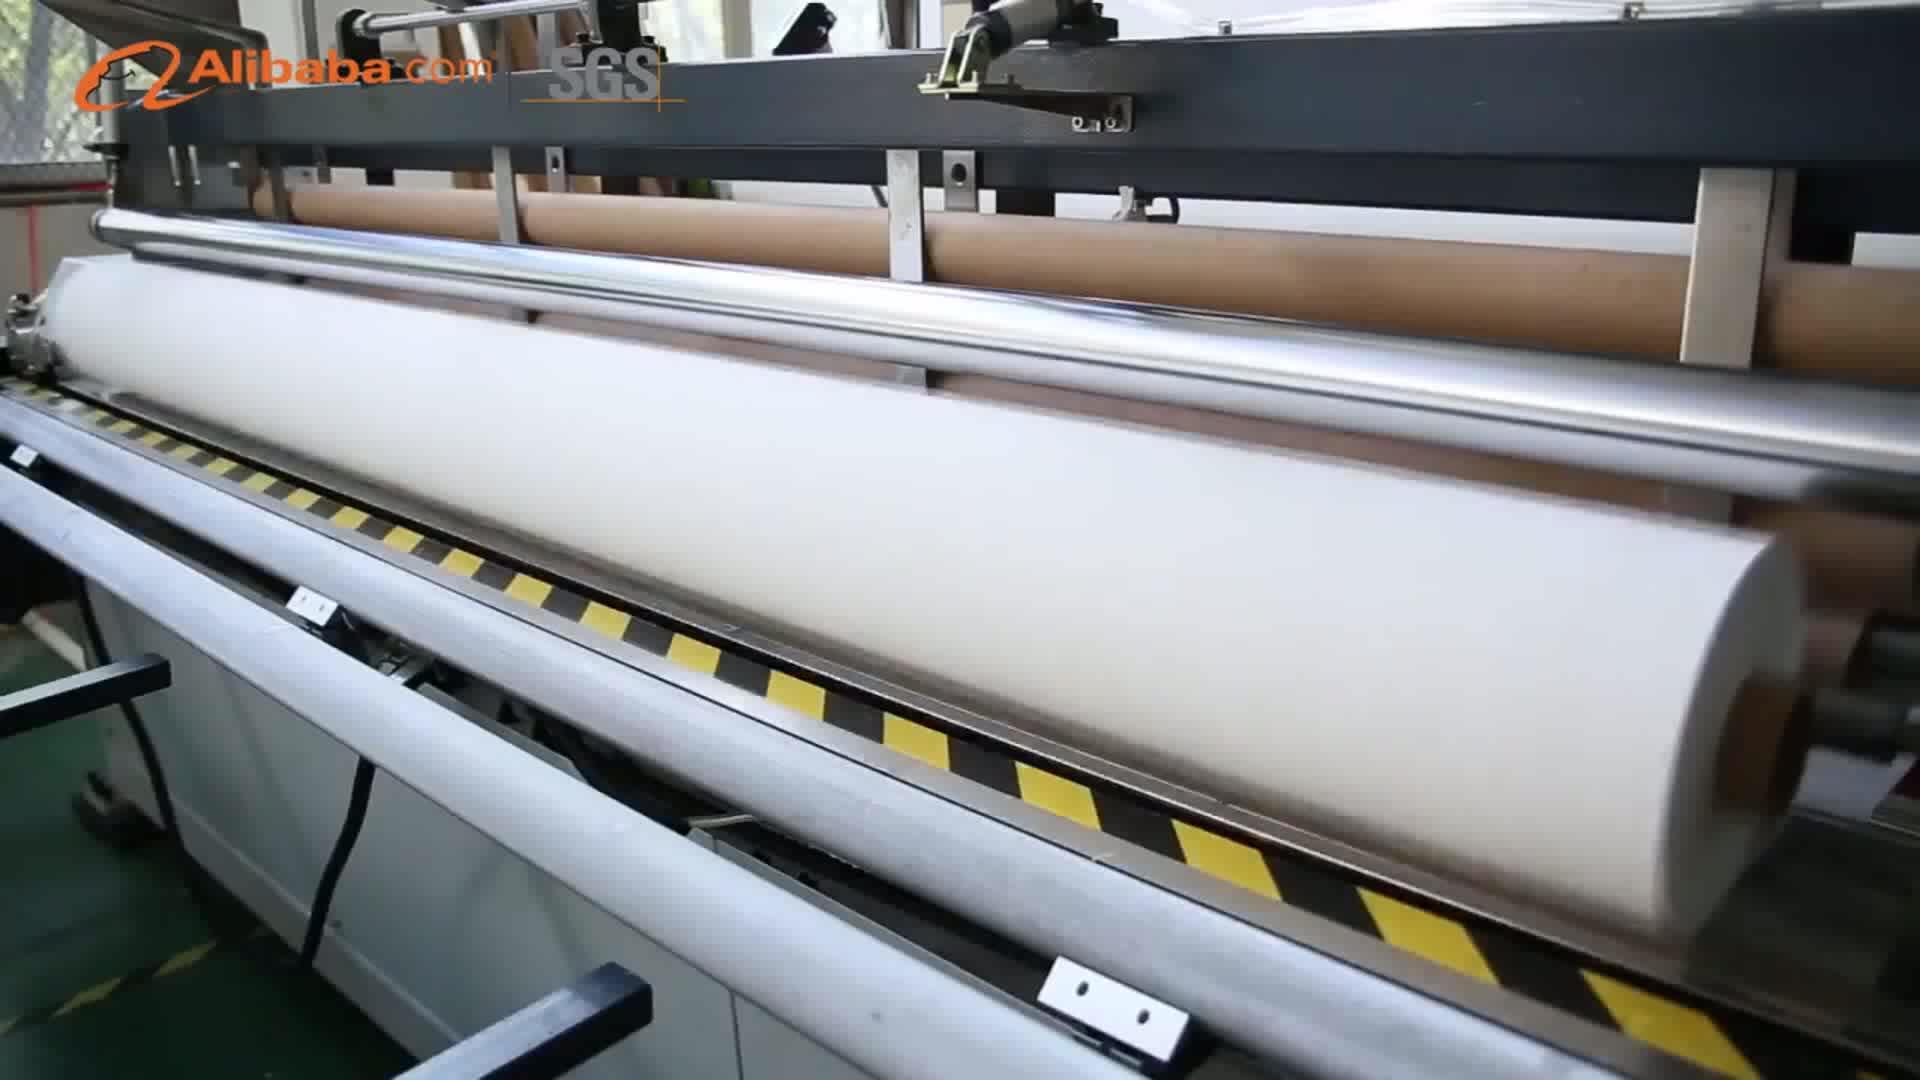 Rolo de Tecido misto de Celulose Branca Natural 2 Ply 160 Folhas de Papel de seda Personalizado Embossing Guardanapo de Papel Papel Higiênico